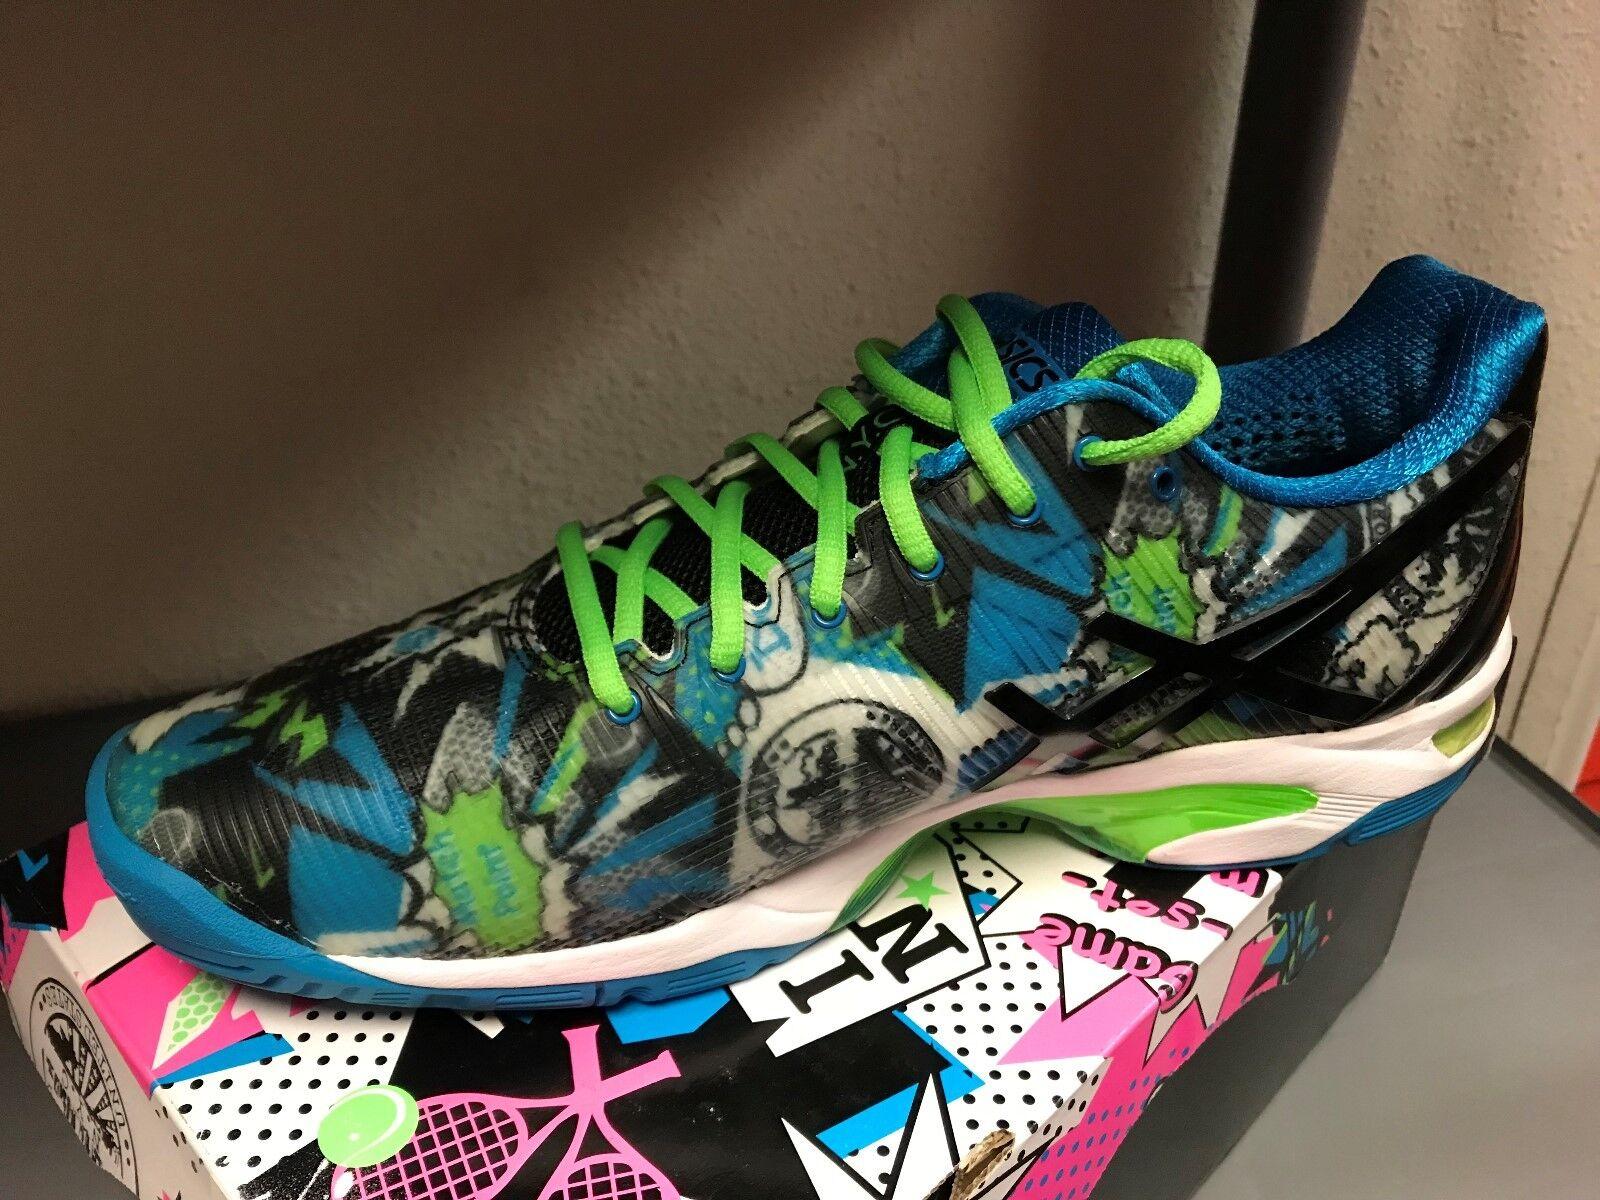 Asics Hombre Gel Solución Velocidad 3 L. E. NYC Tenis Zapato